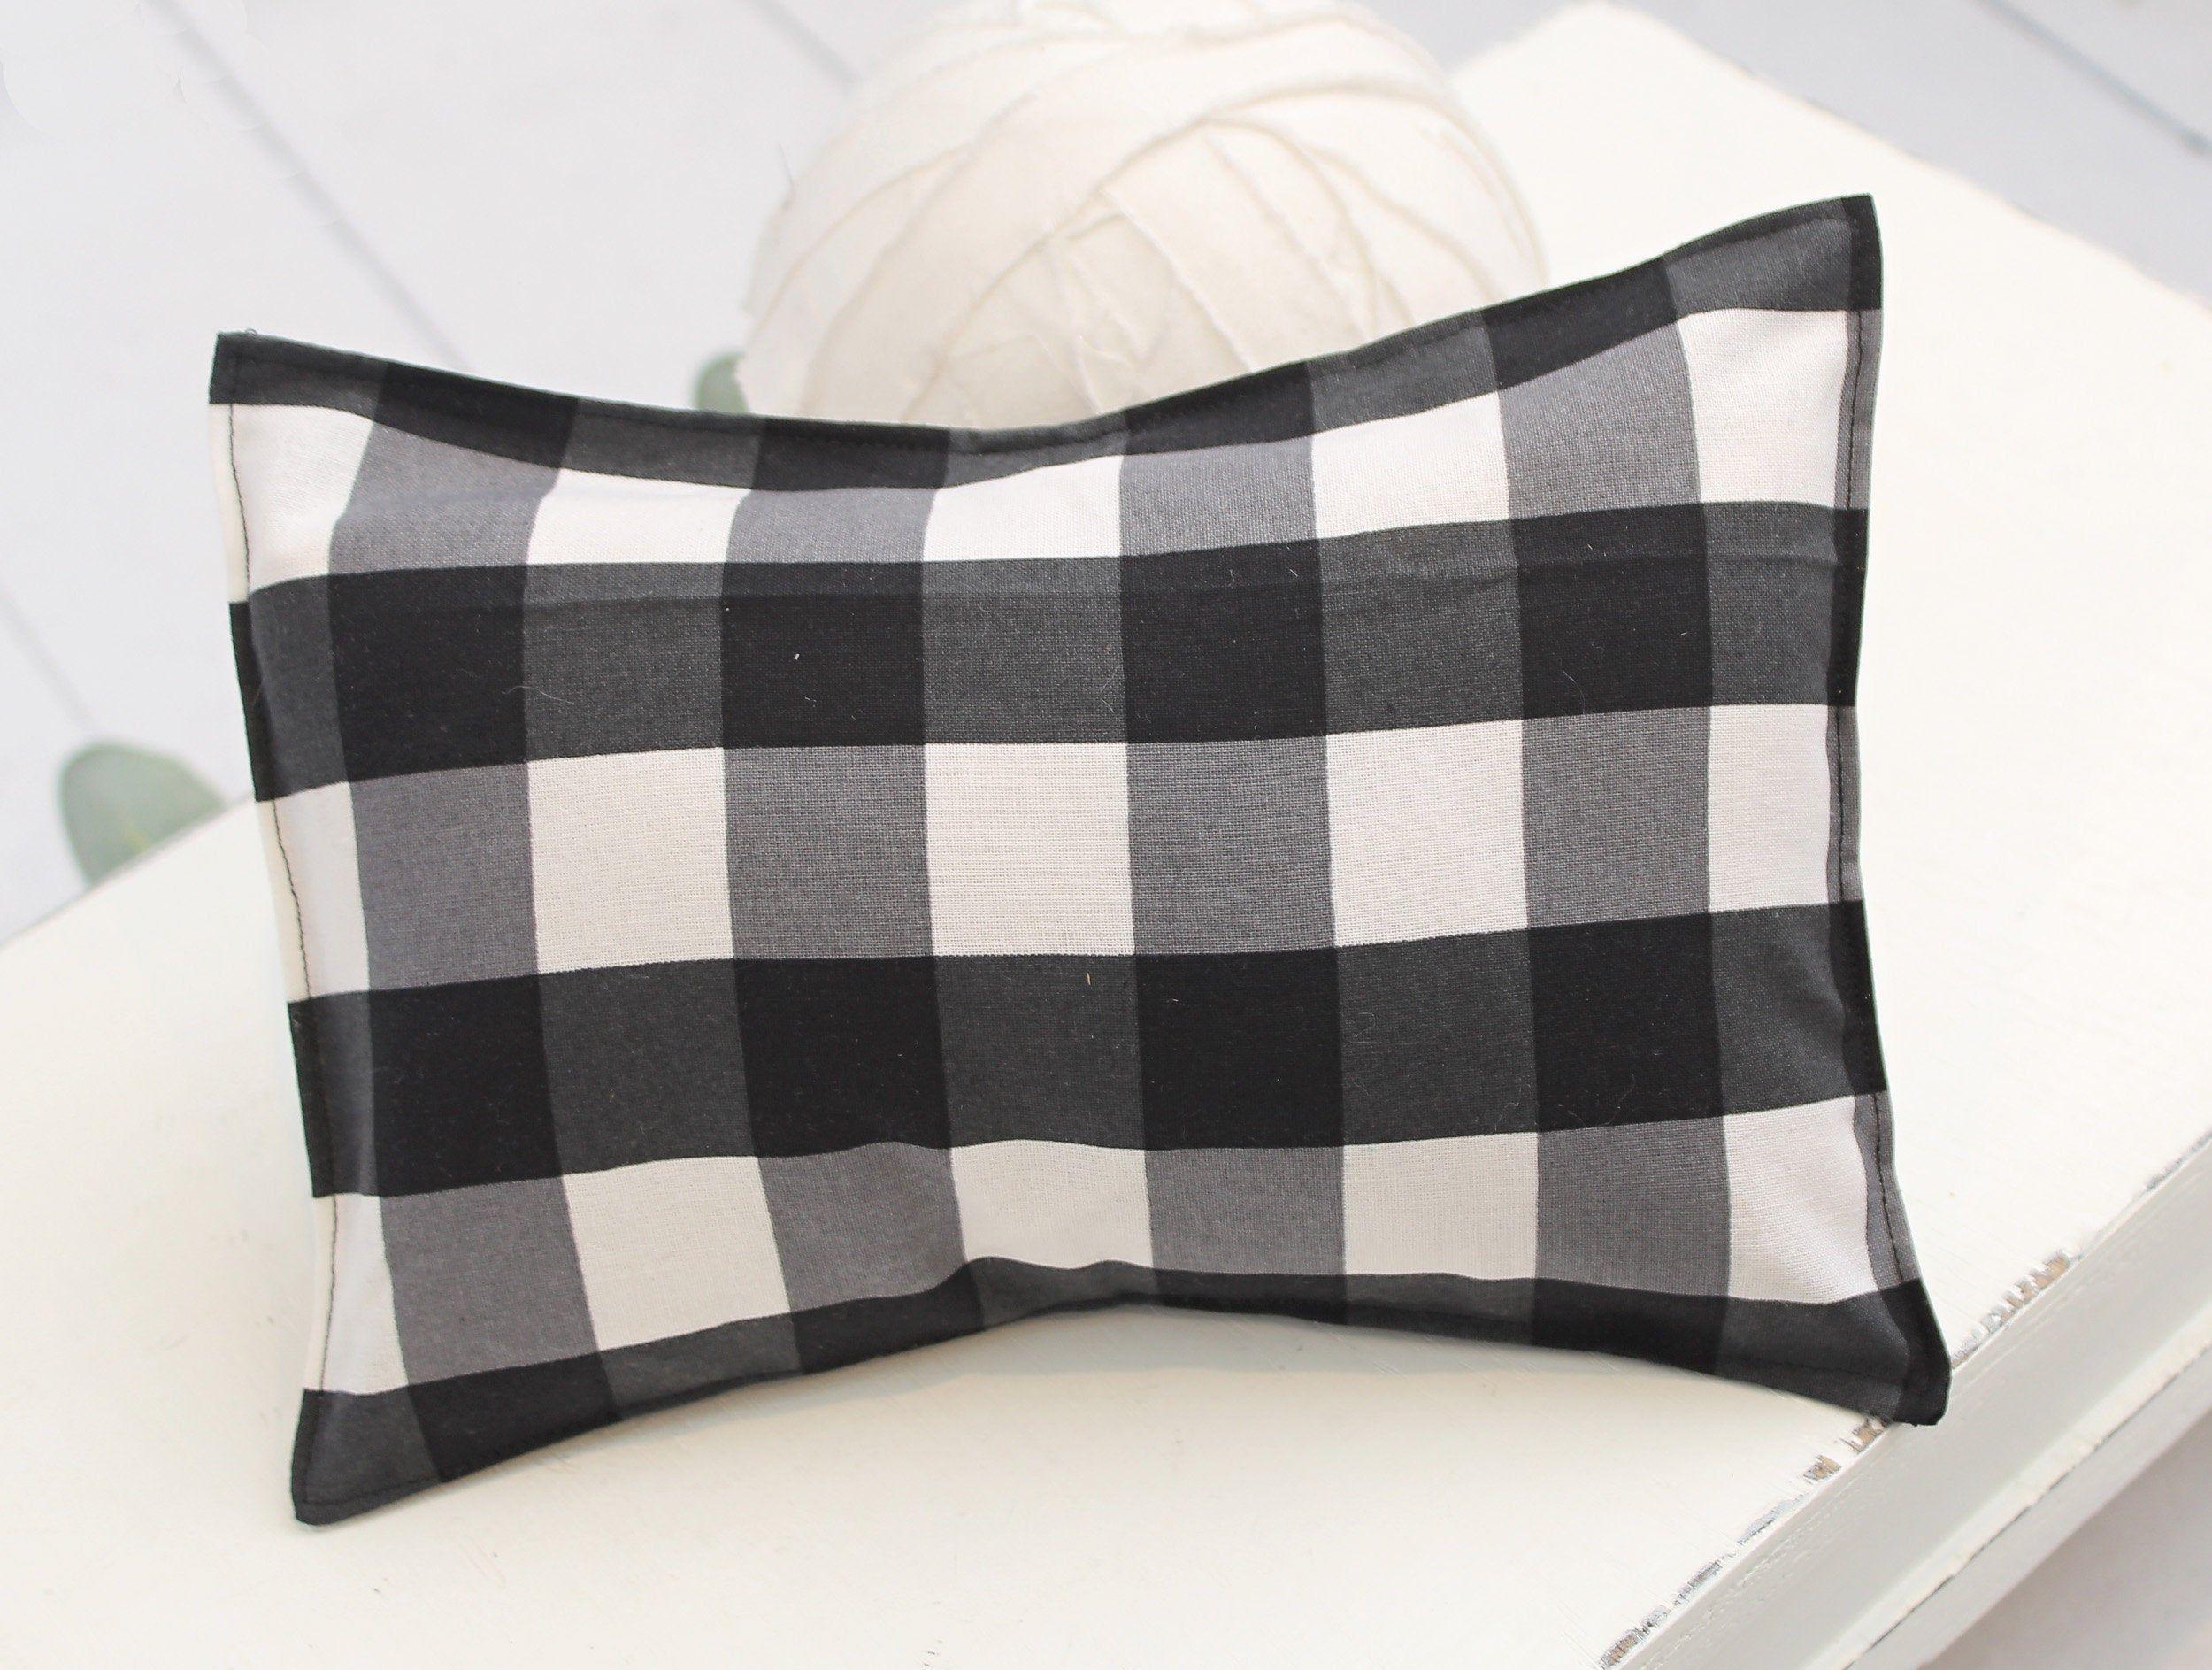 Checks Balances Newborn Pillow Sham In A Black And White Buffalo Plaid Gingham Check Cotton Rts In 2020 Newborn Pillow Pillow Shams Sham